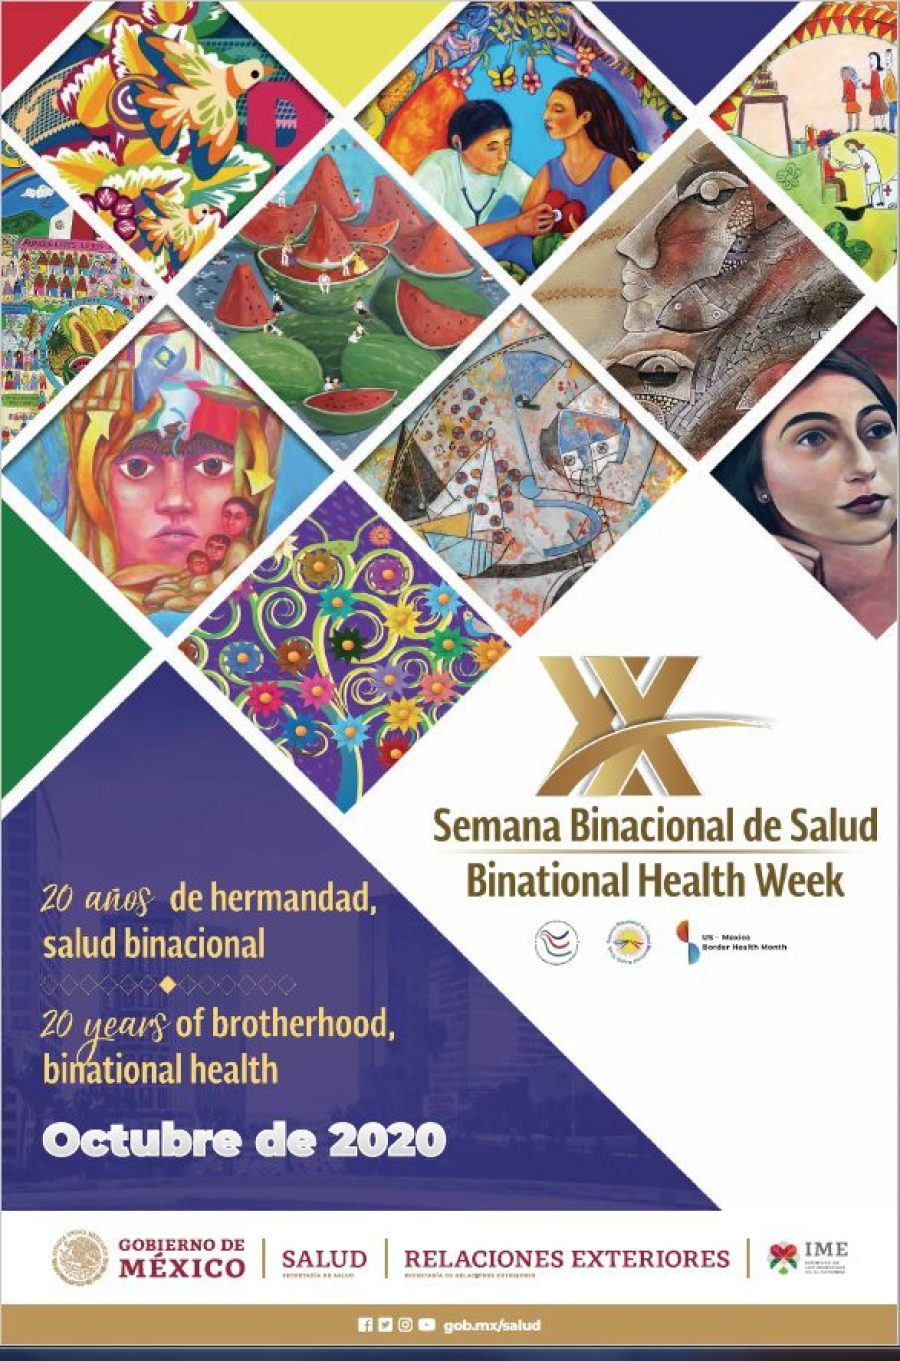 Binational Health Week Poster, event info transcribed below